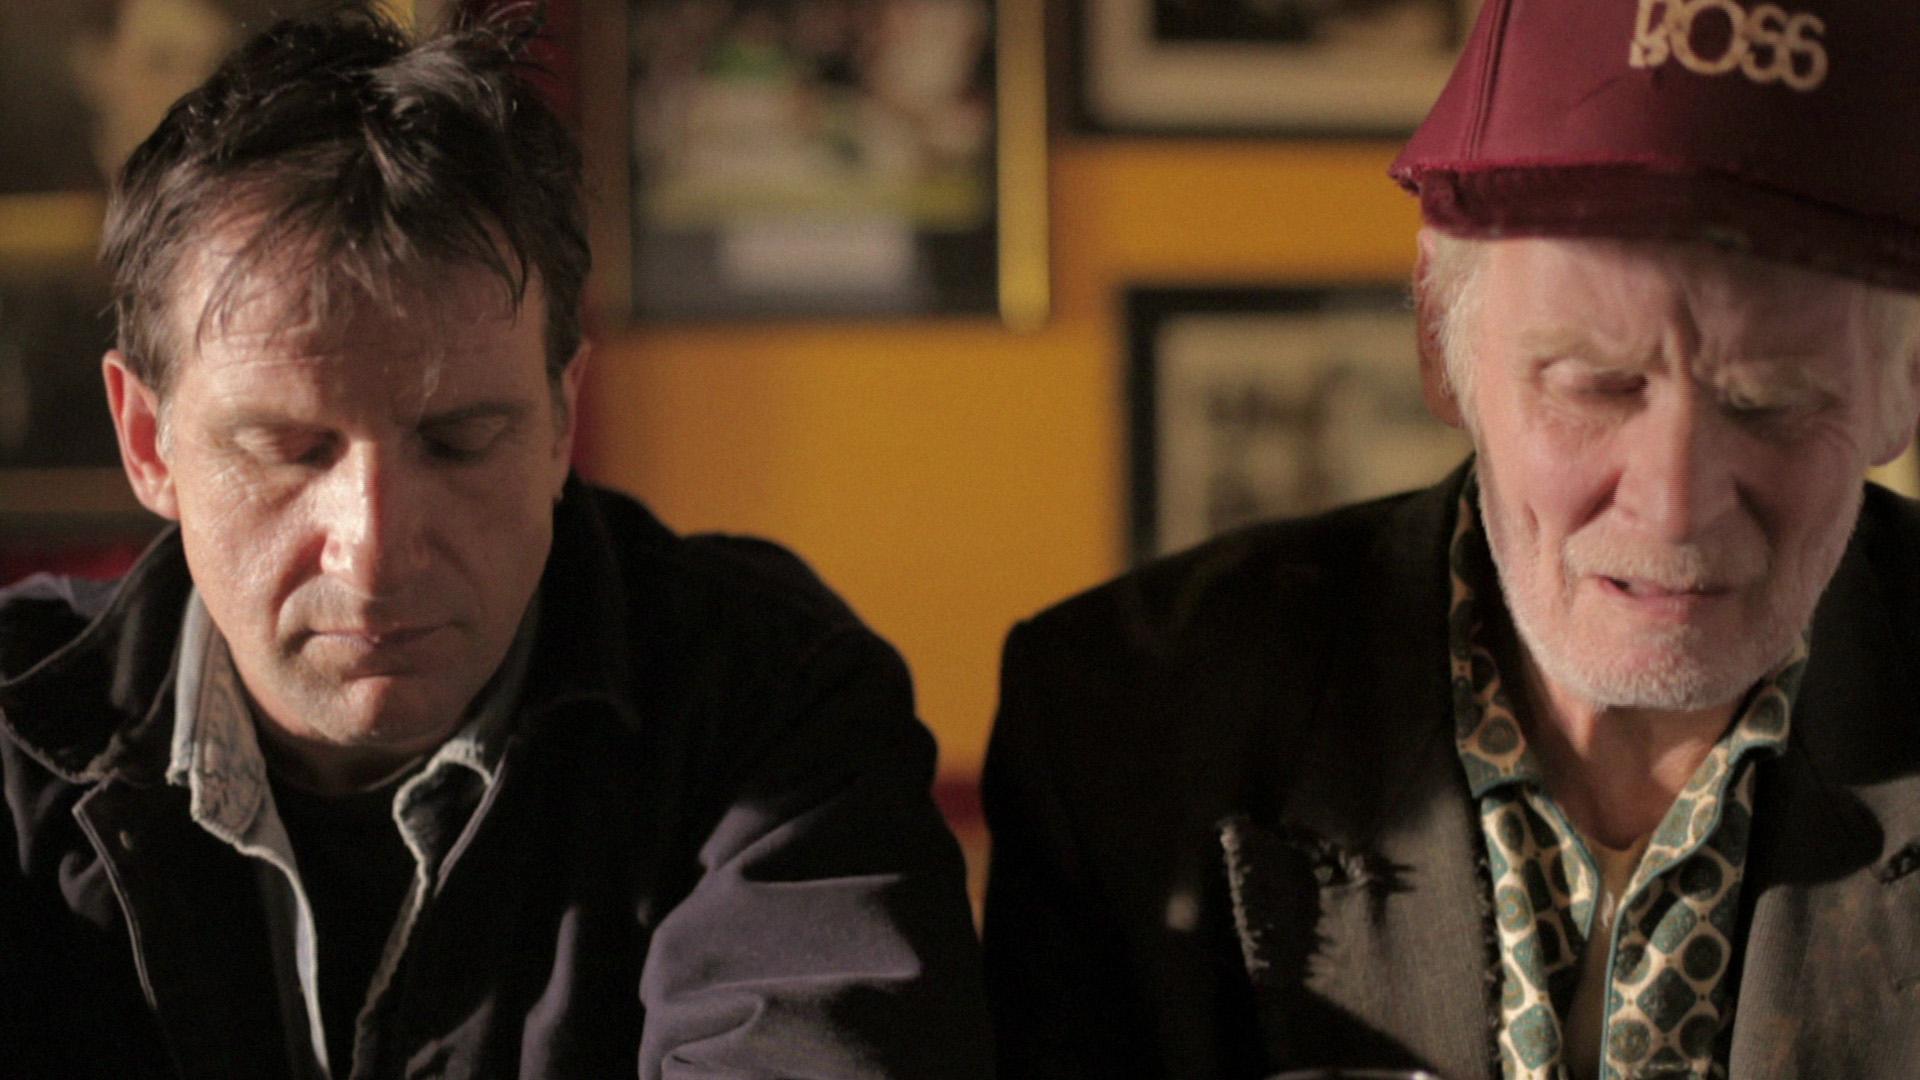 The-Pier-NITV-Network-Ireland-Television-3.jpg